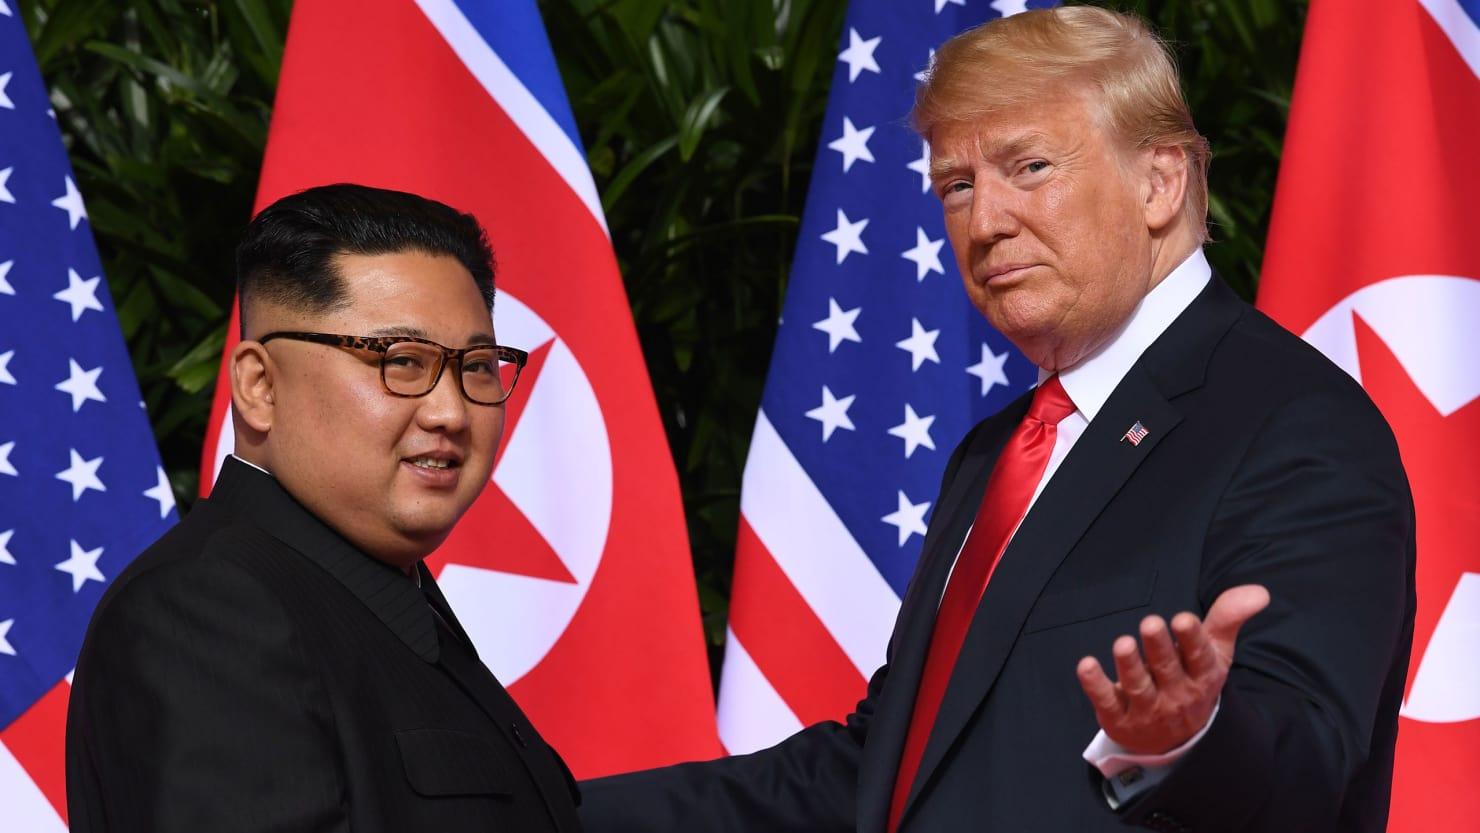 casino news 2018 Trump Kim Jong Un